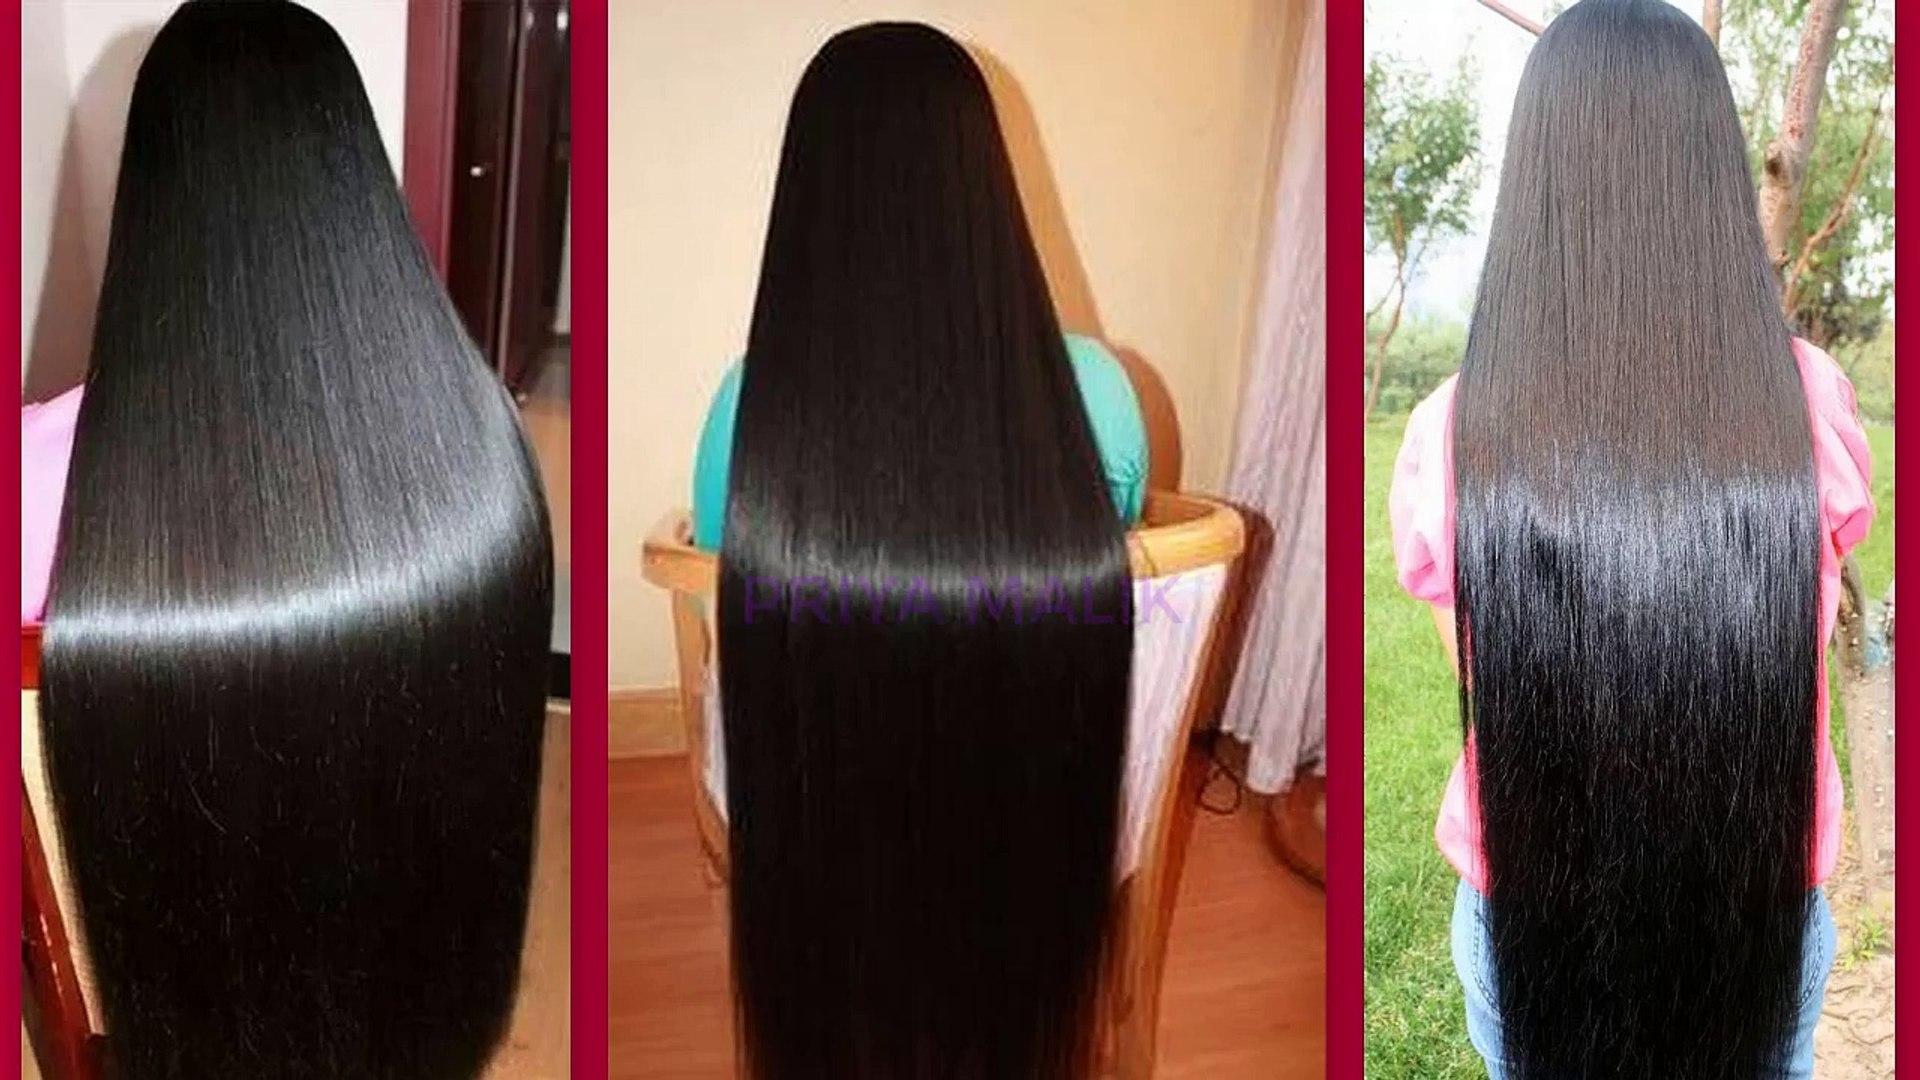 GET SHINY HAIR,SILKY HAIR, SOFT HAIR ,SMOOTH HAIR NATURALLY~ HOMEMADE HAIR MASK FOR DRY DA